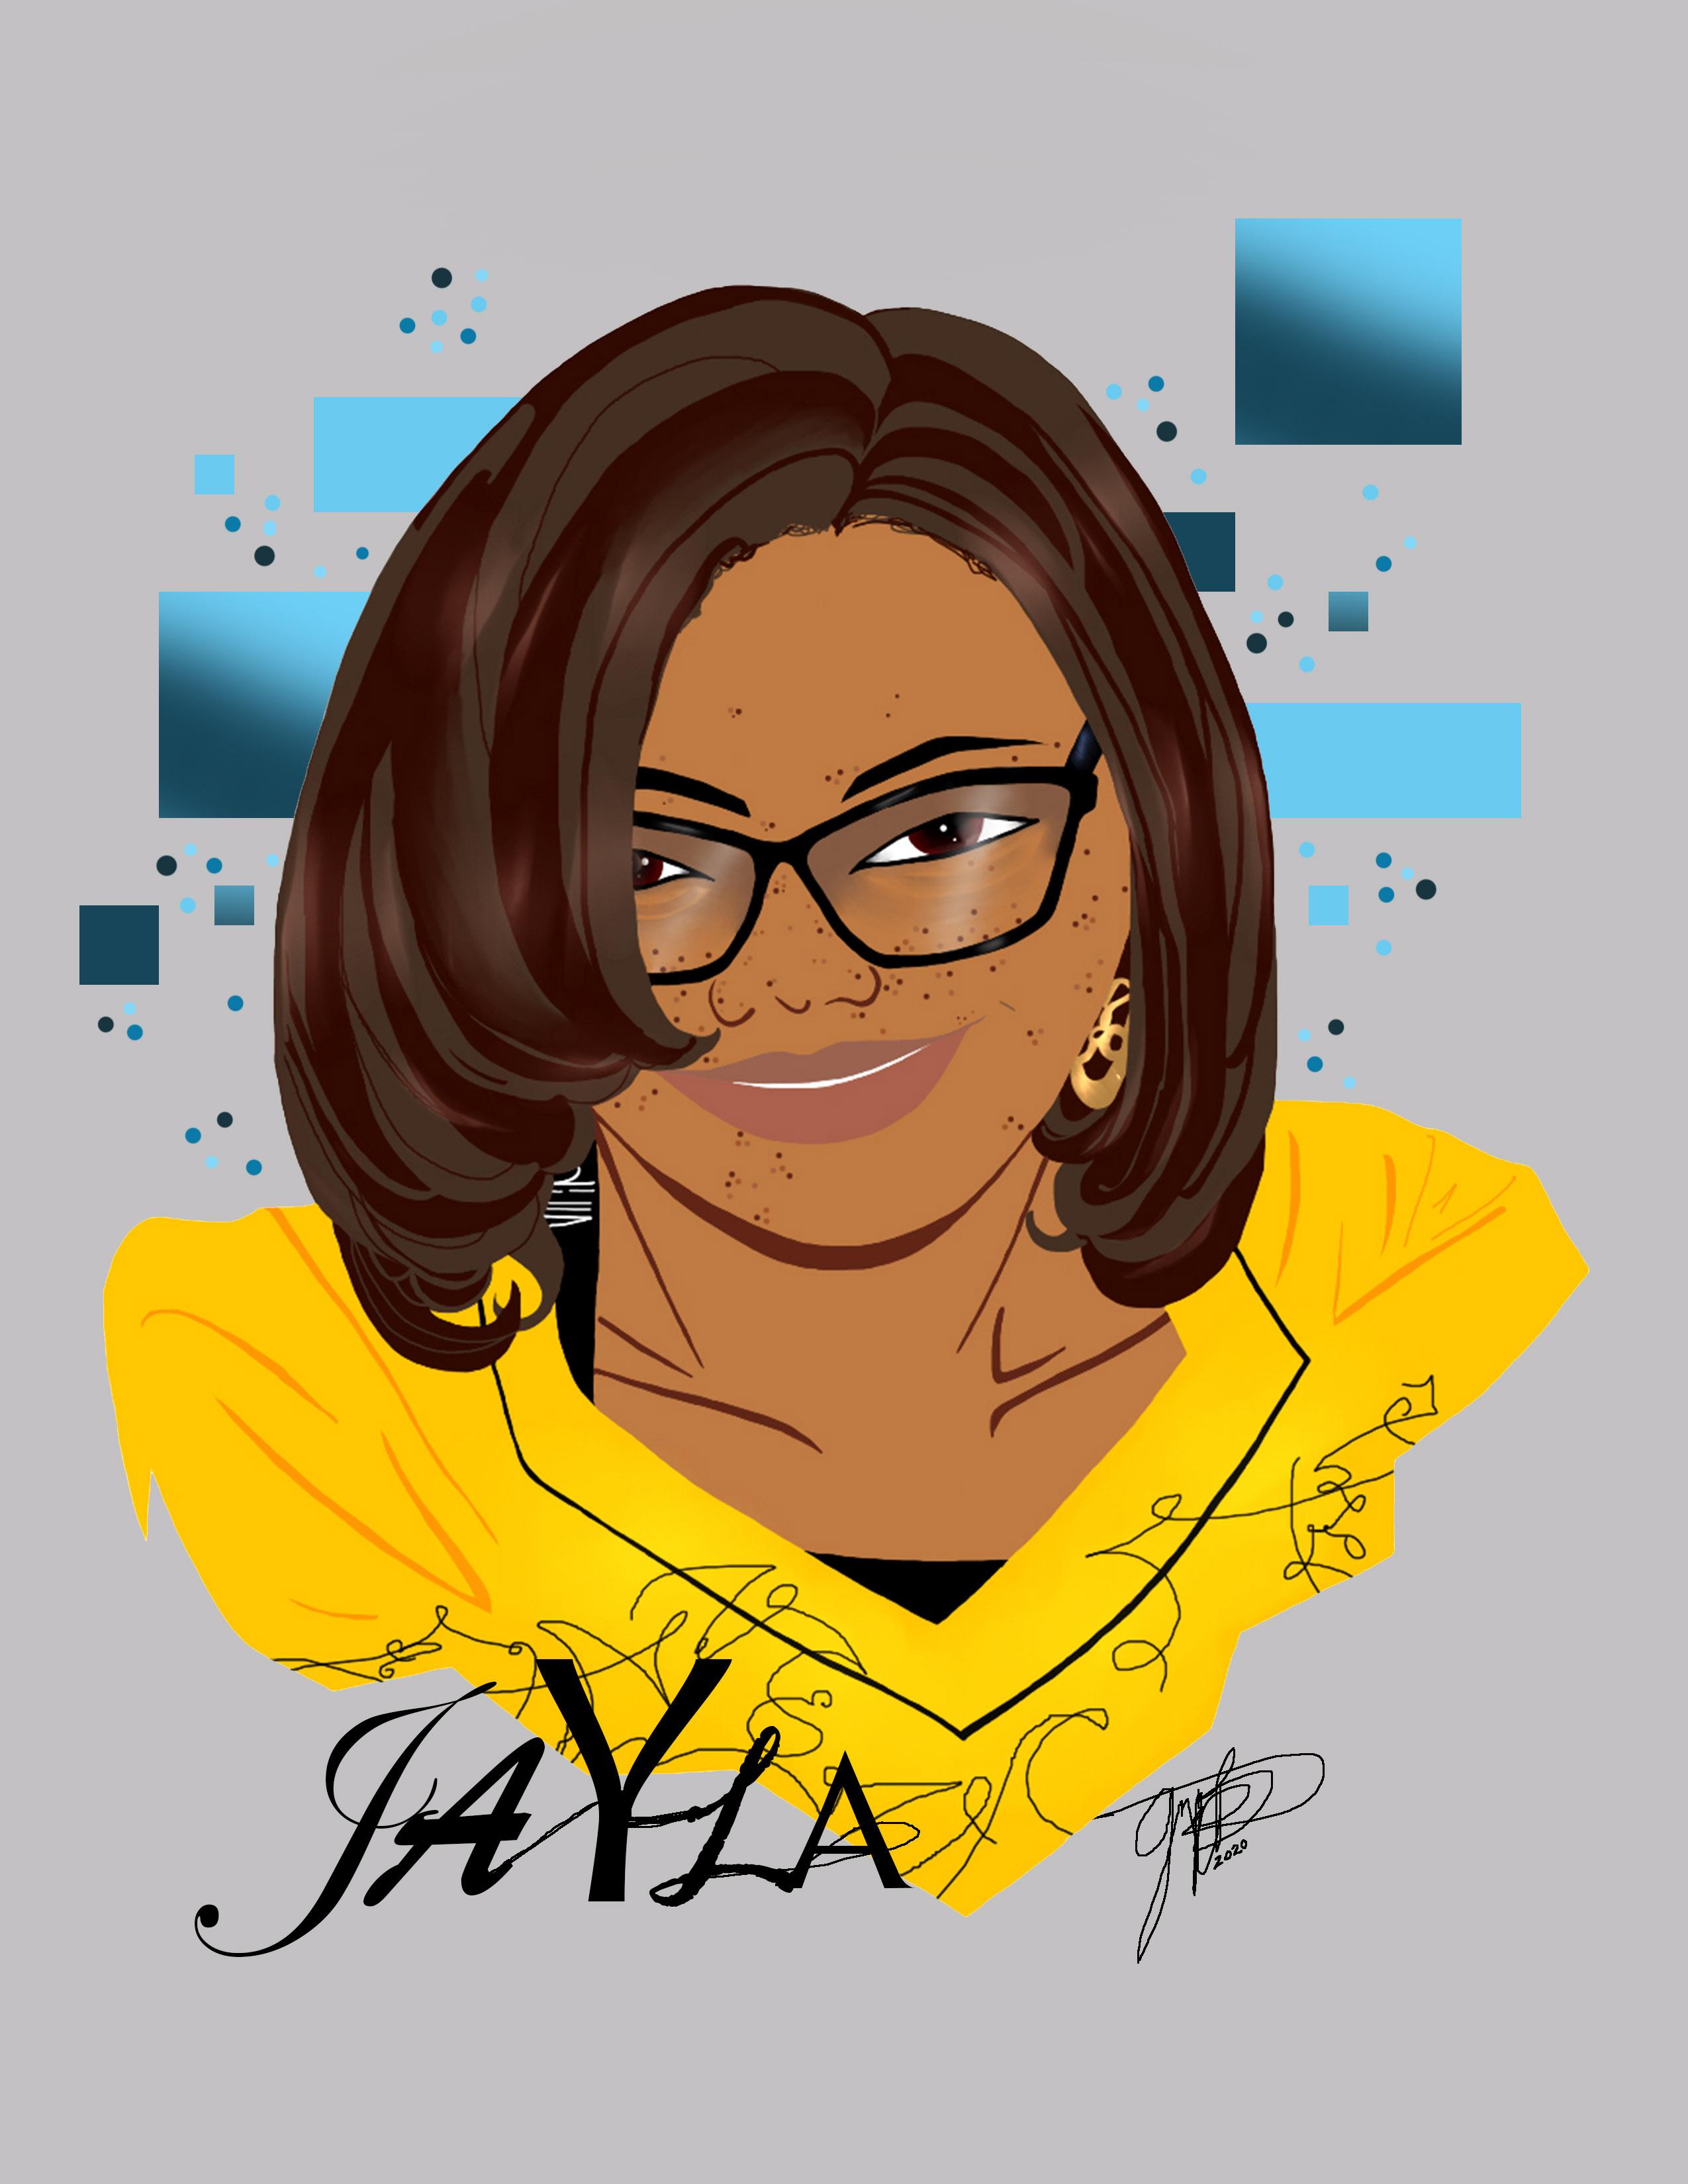 Jayla Goddess Caricature